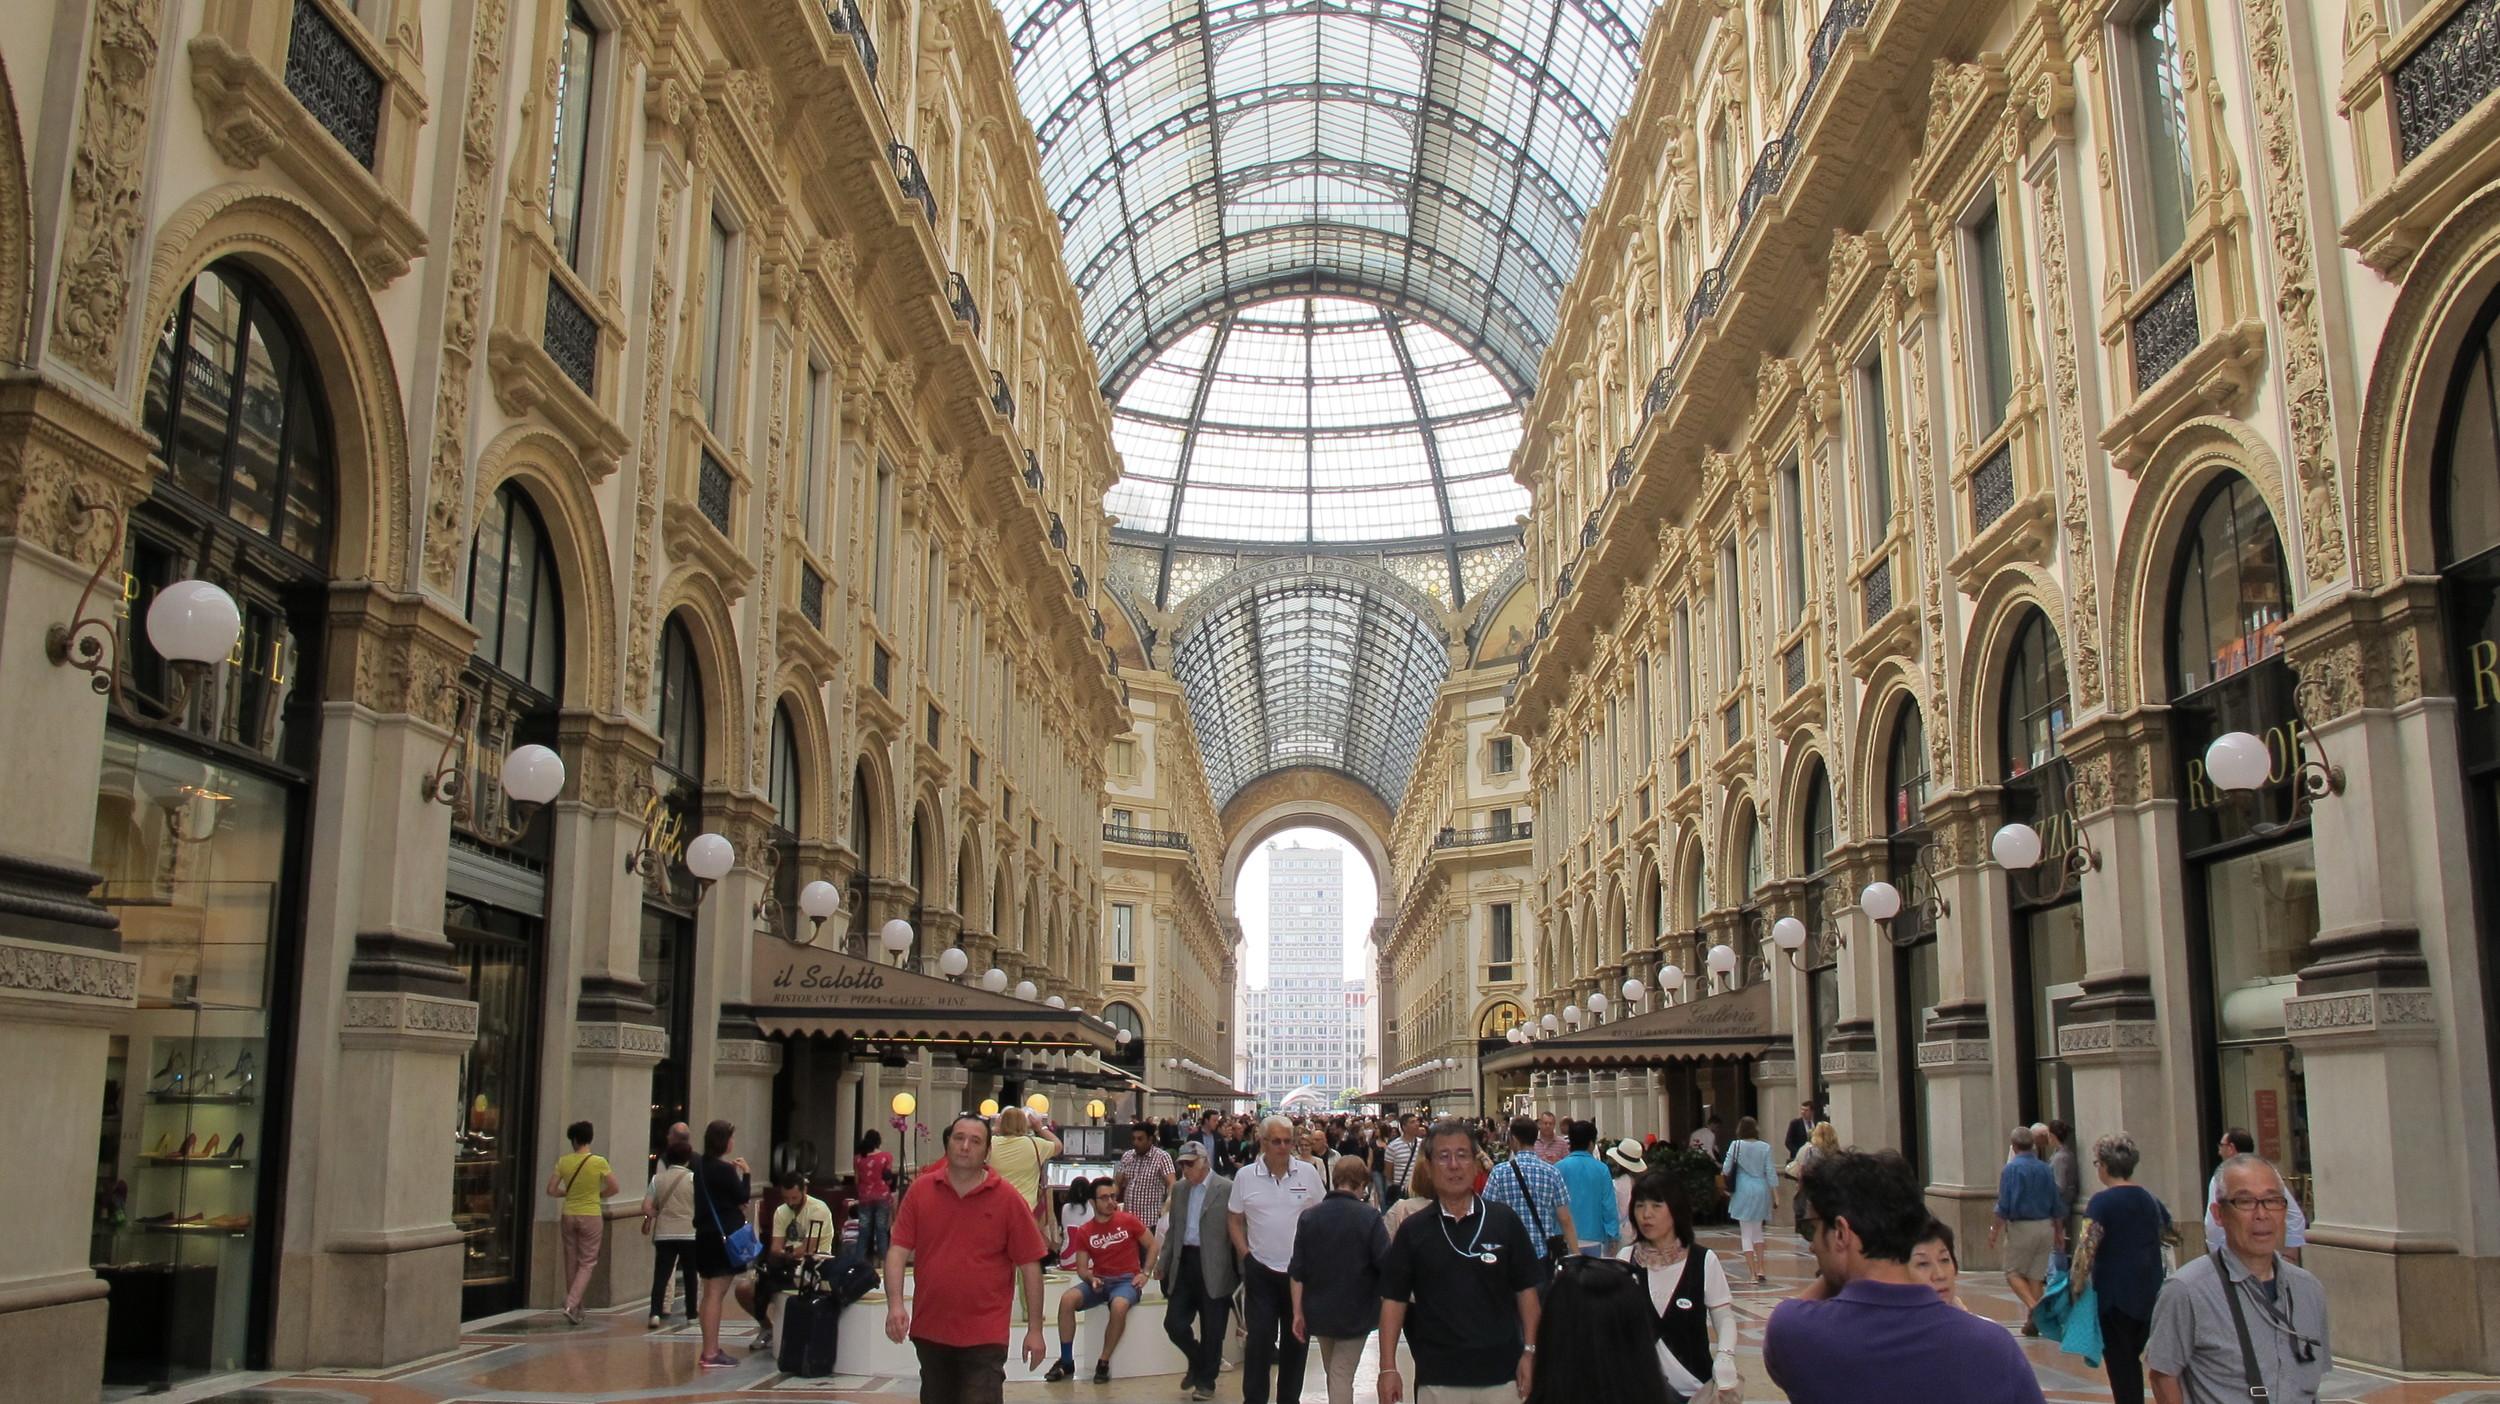 Galleria Vittorio Emmanuelle Milan Italy